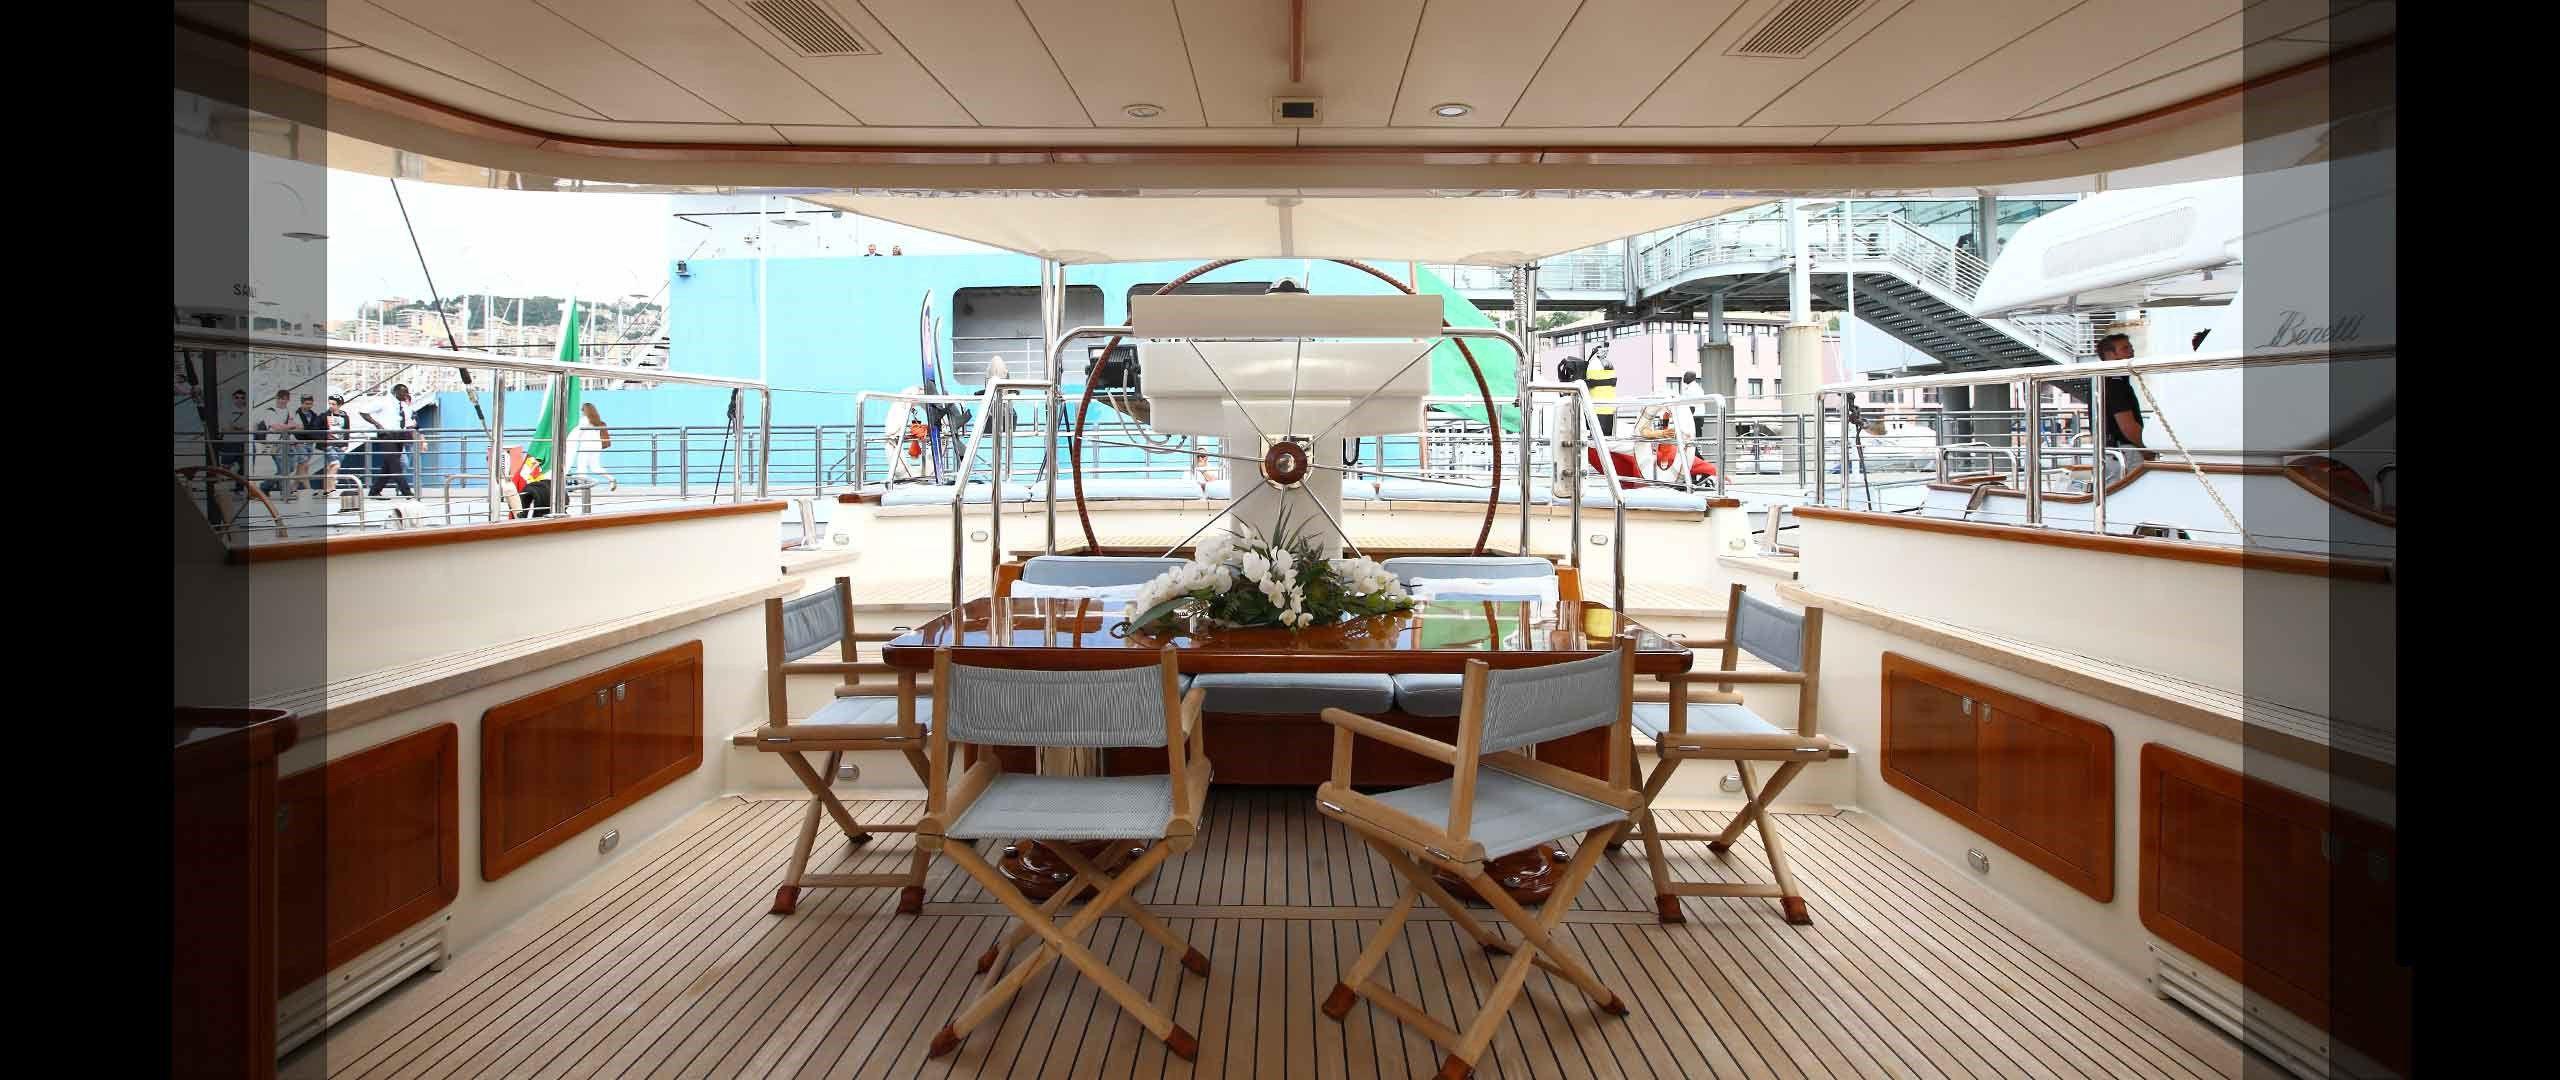 Yacht Heritage M By Pereni Navi - AFT DECK Monaco